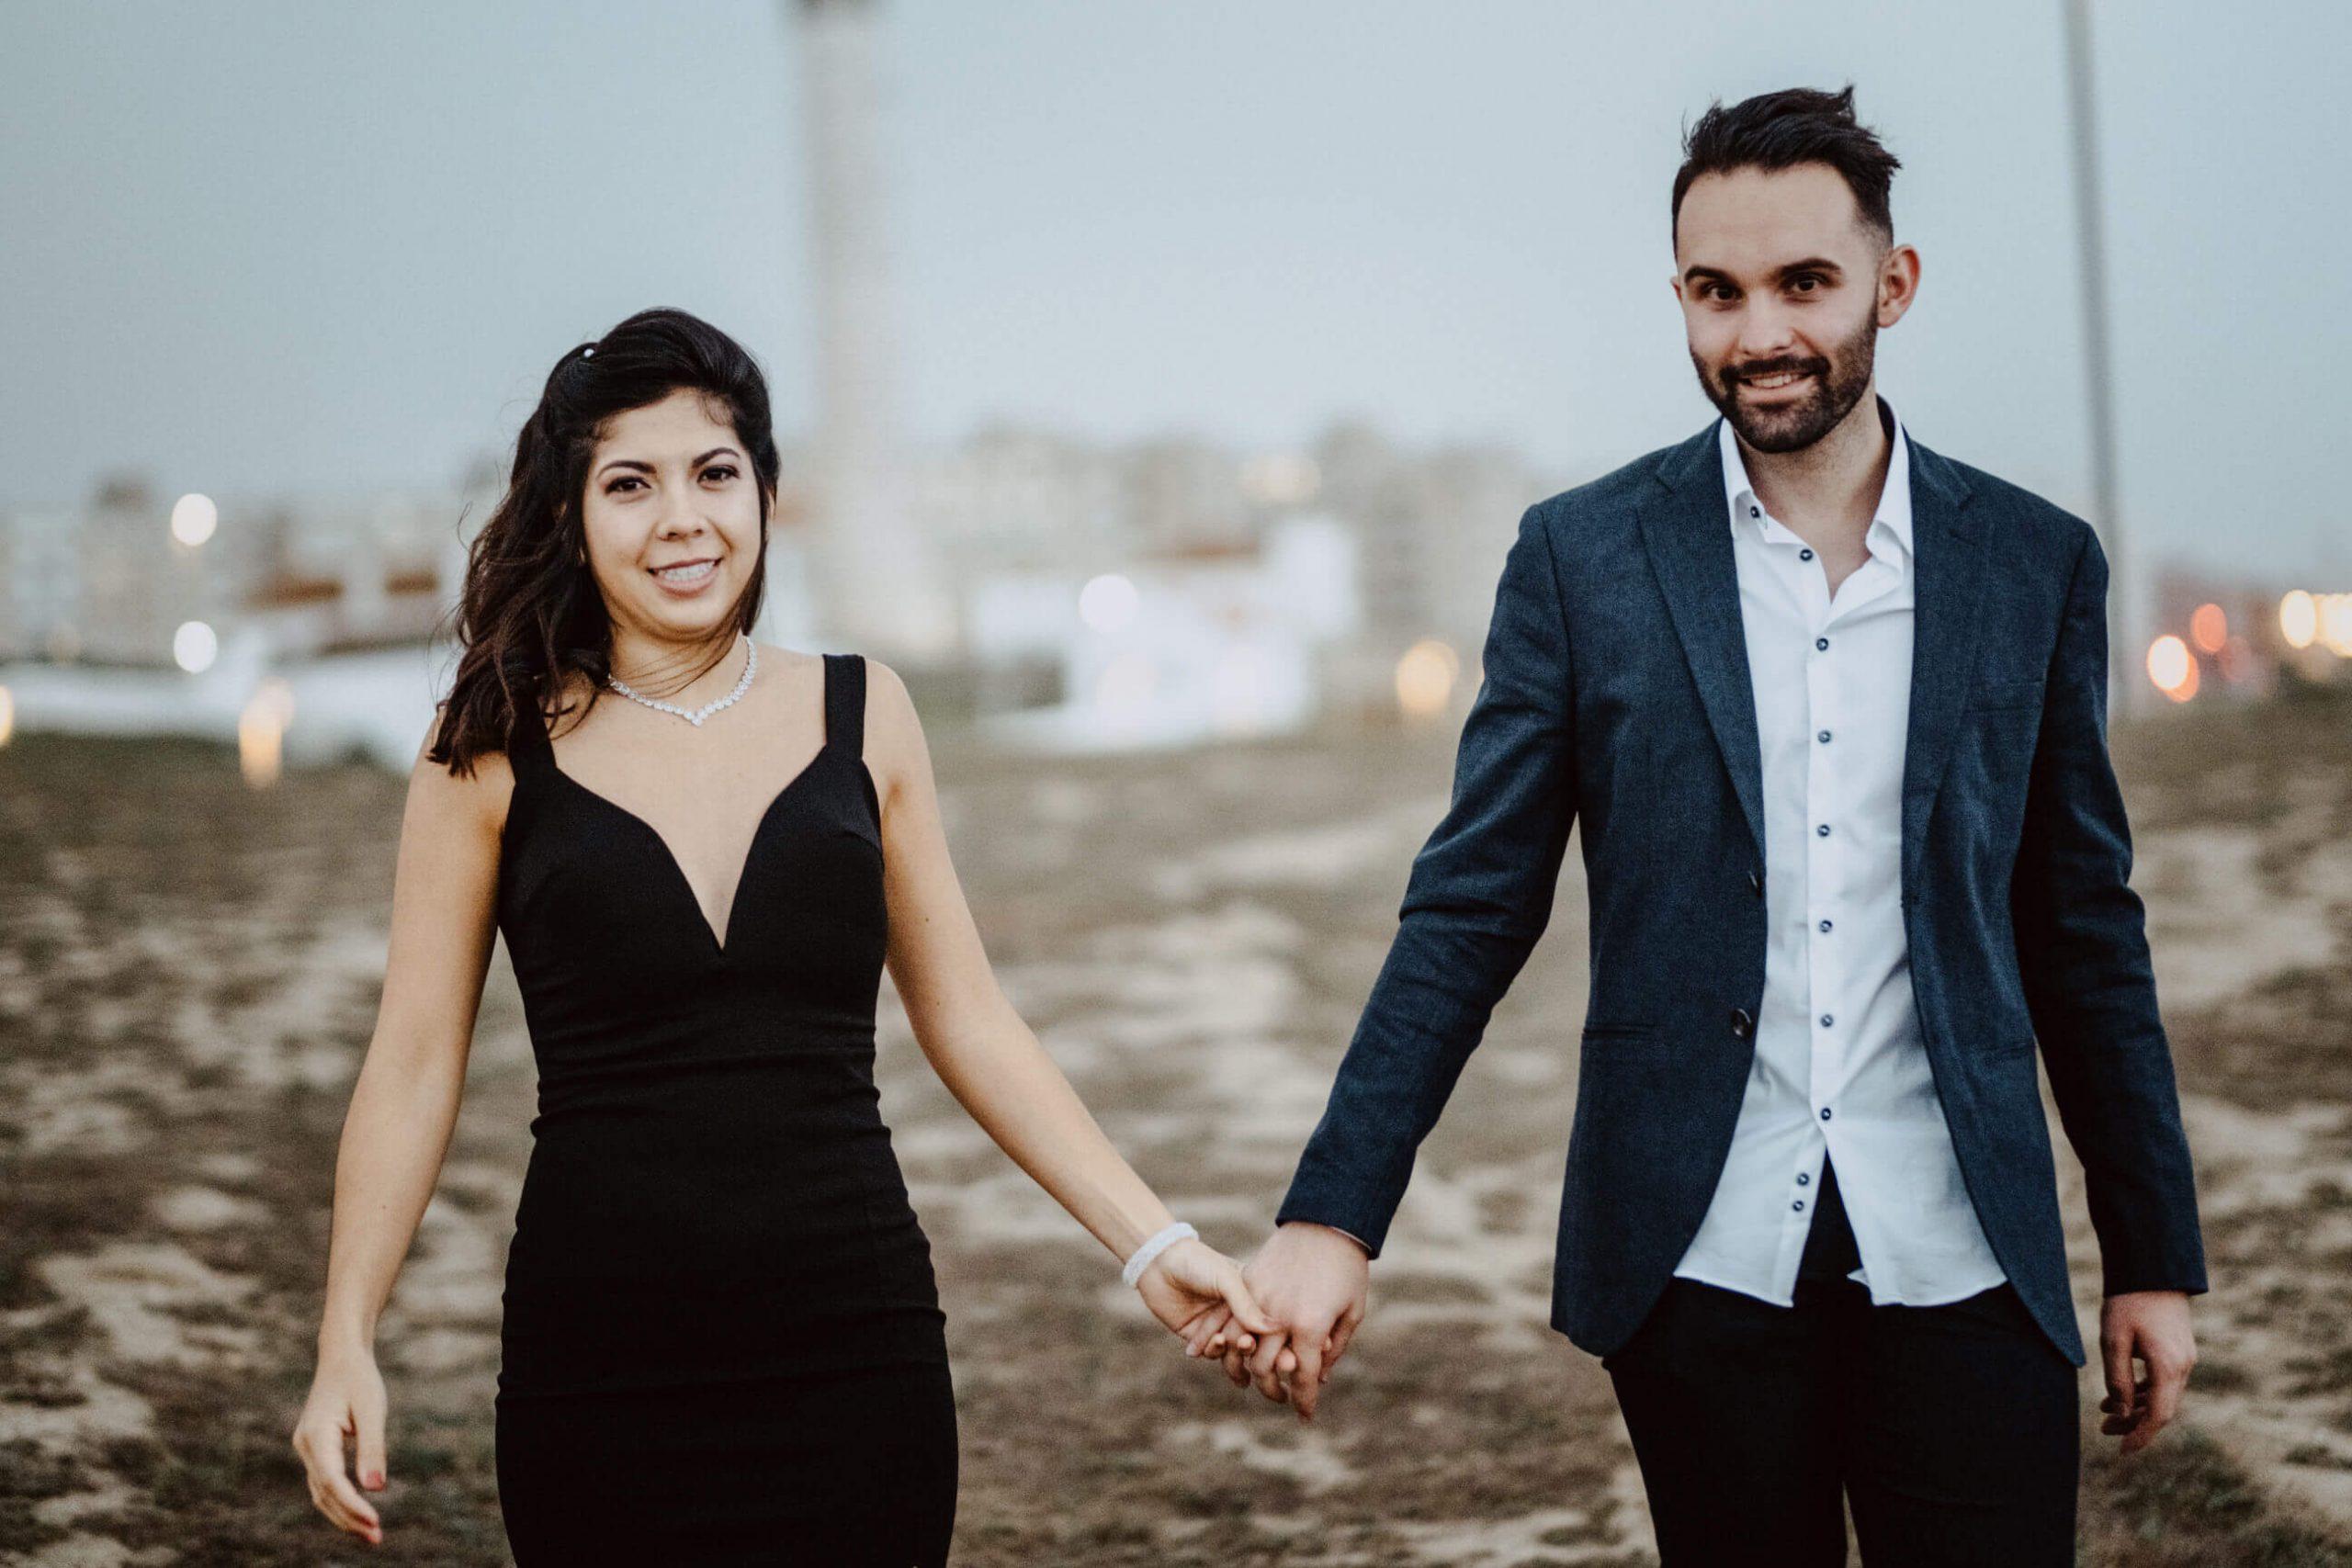 roma-organizacao-eventos-pedido-casamento-casa-de-cha-da-boa-nova-porto-portugal-25